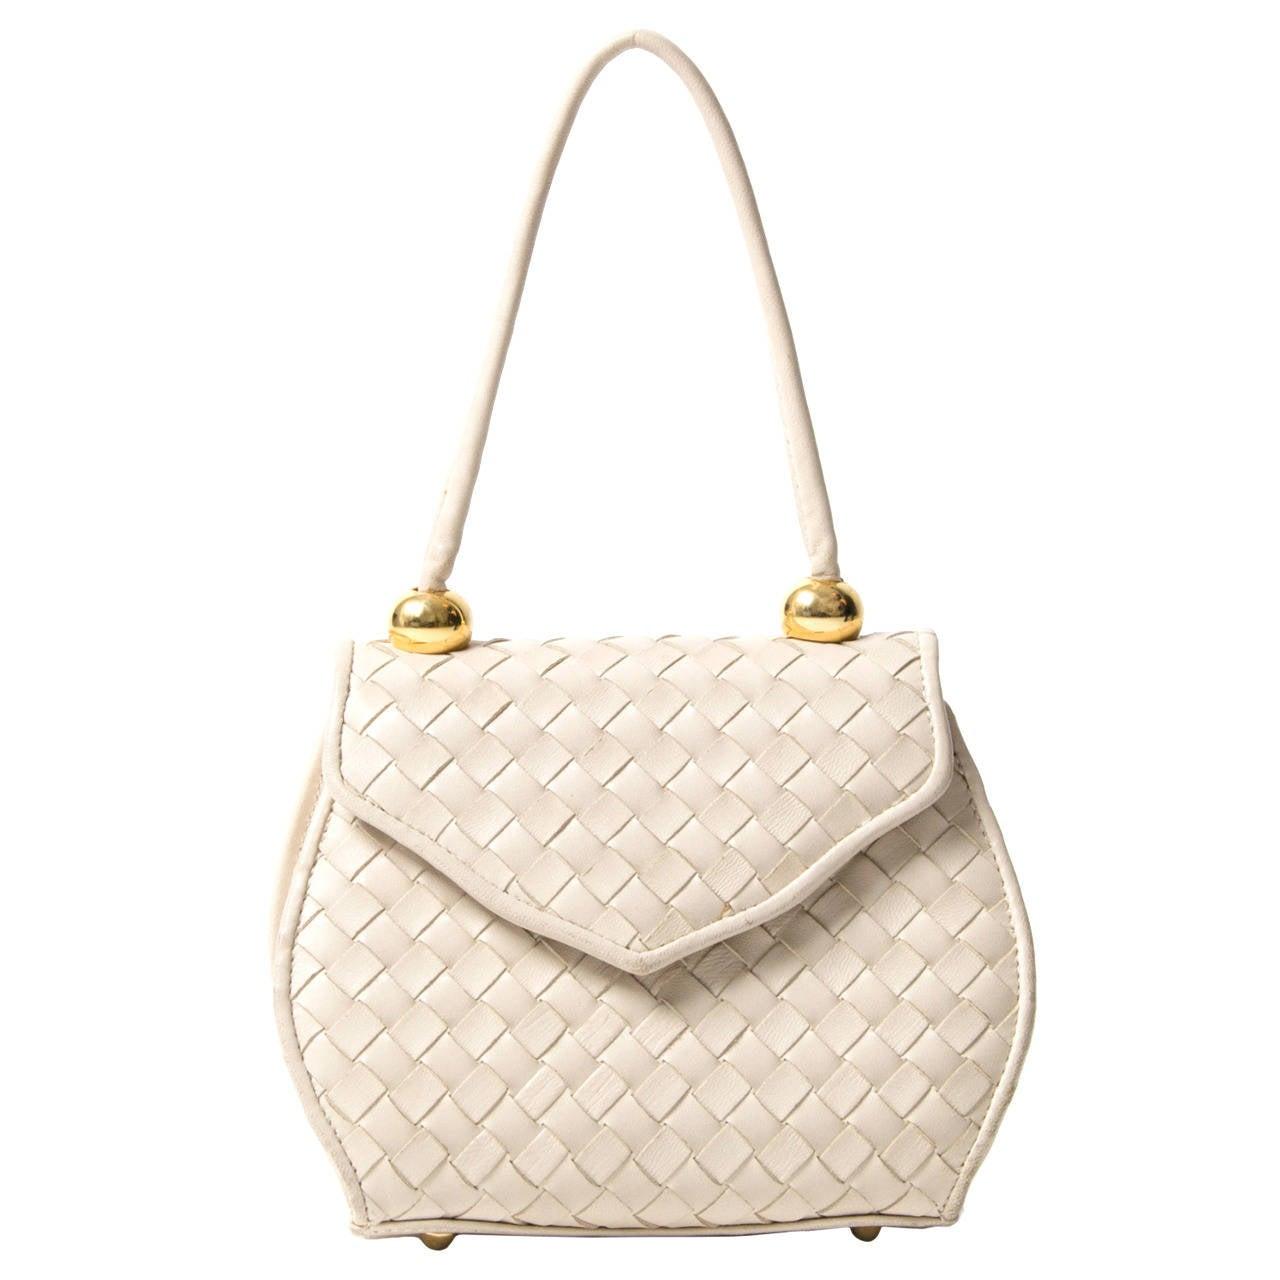 Small Vintage Cream Bag 1